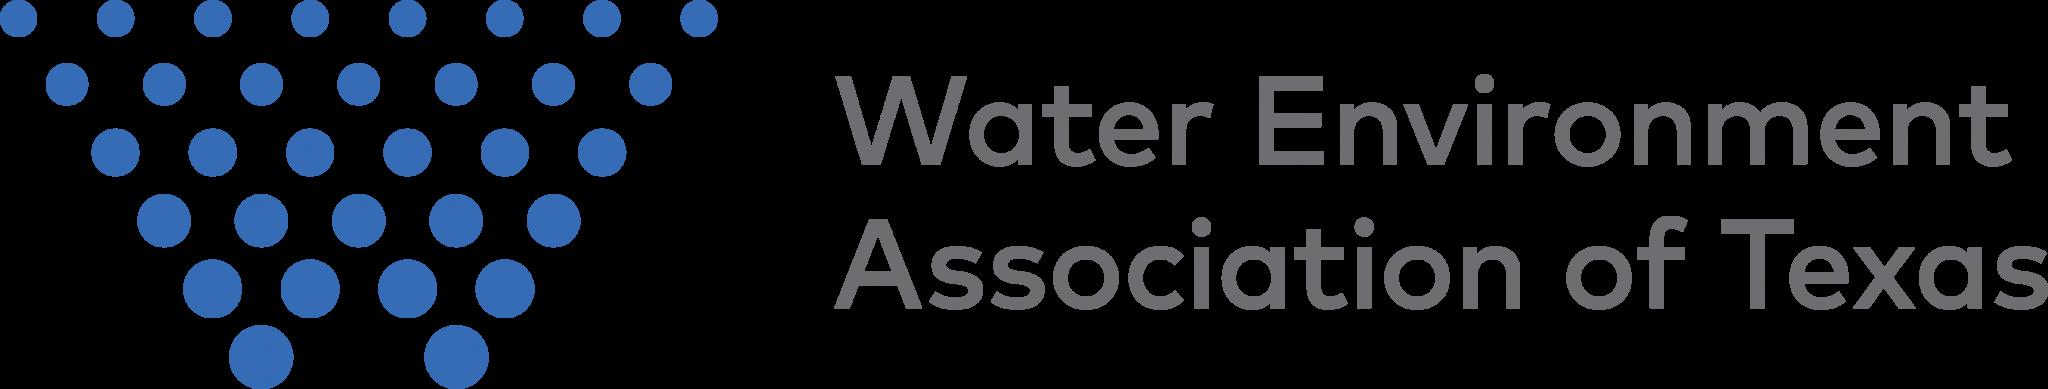 Water Environment Association of Texas logo